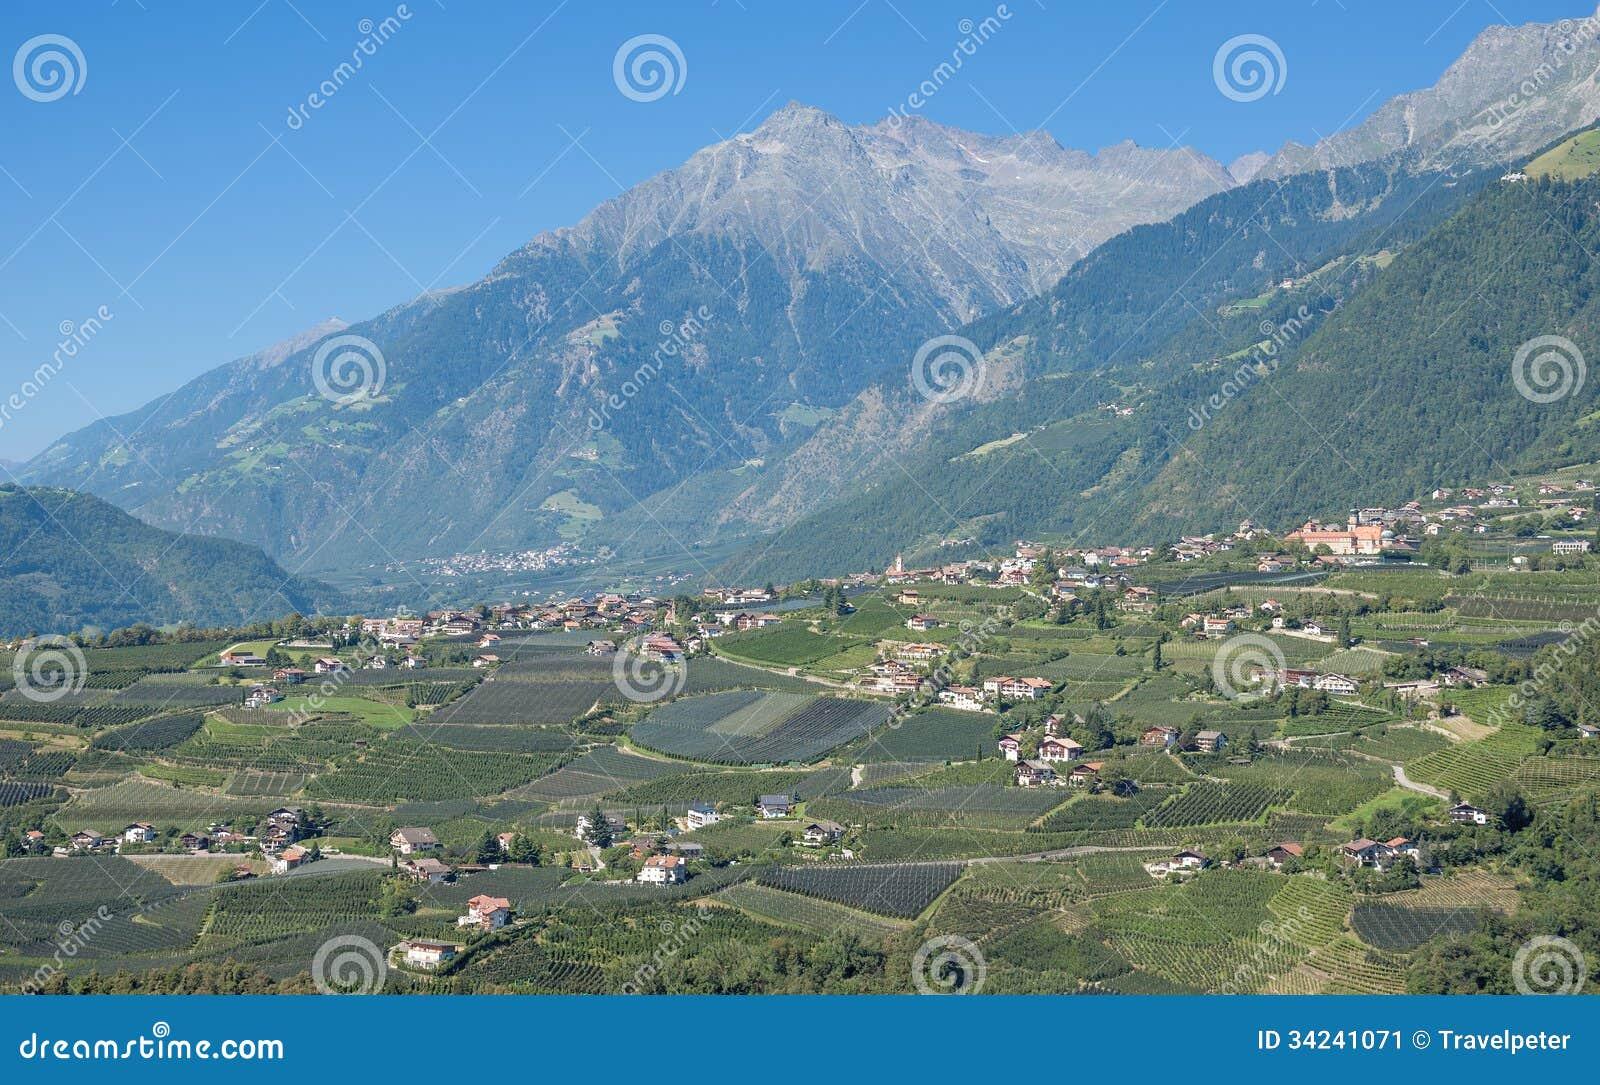 Dorf tirol south tyrol trentino dolomites italy stock for Design hotel dorf tirol